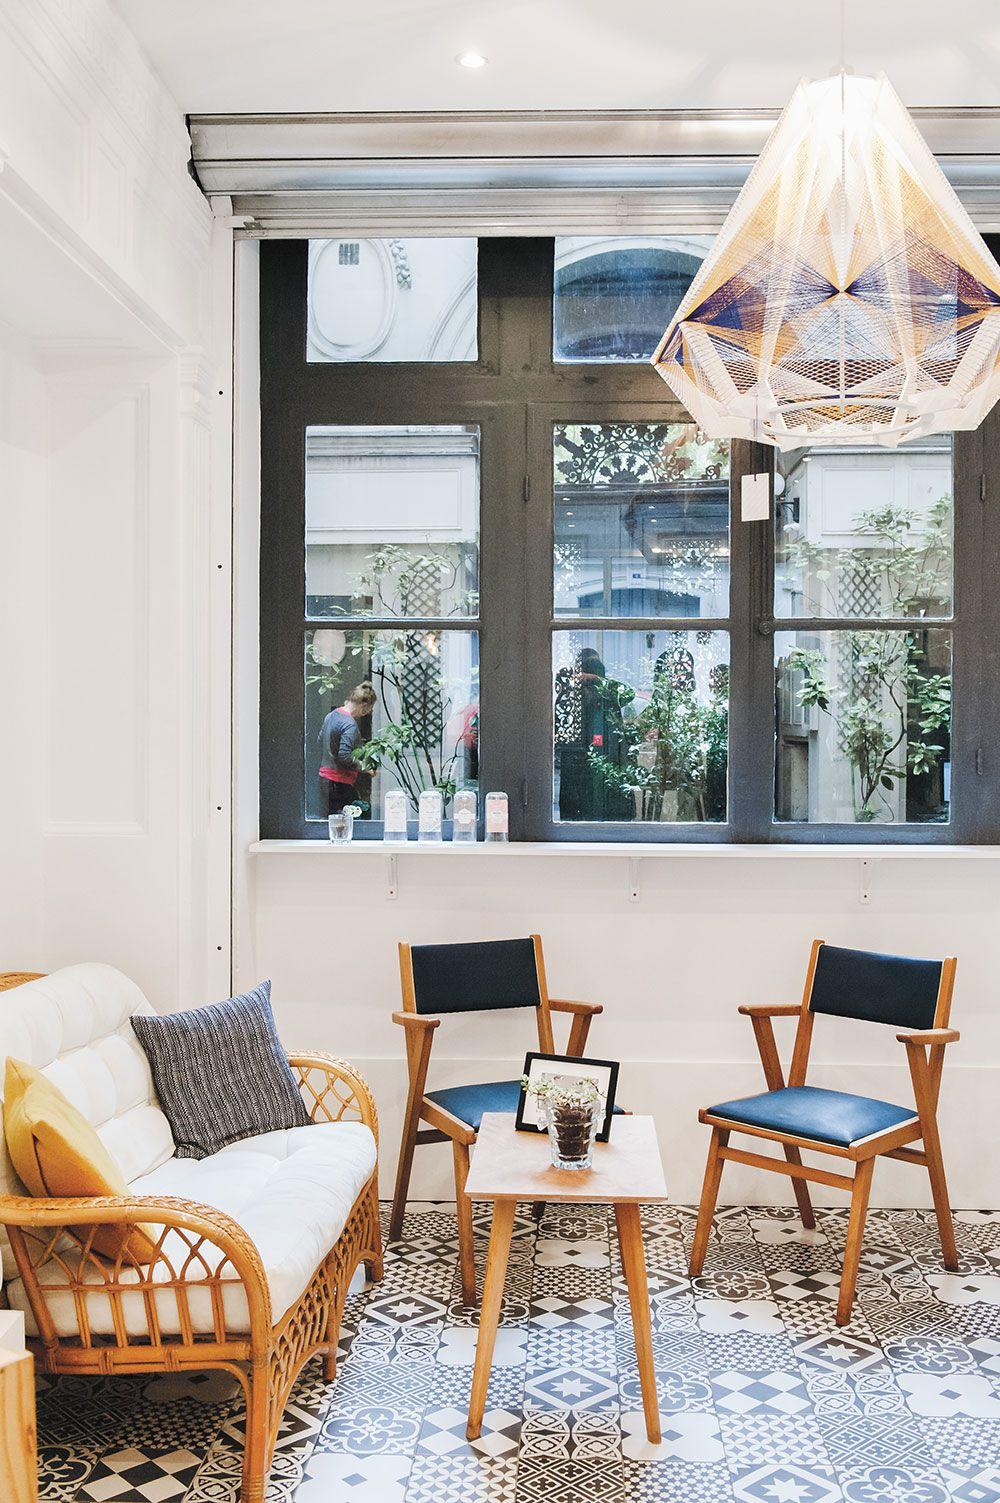 Modern Home Decor Store In Paris. / Sfgirlbybay